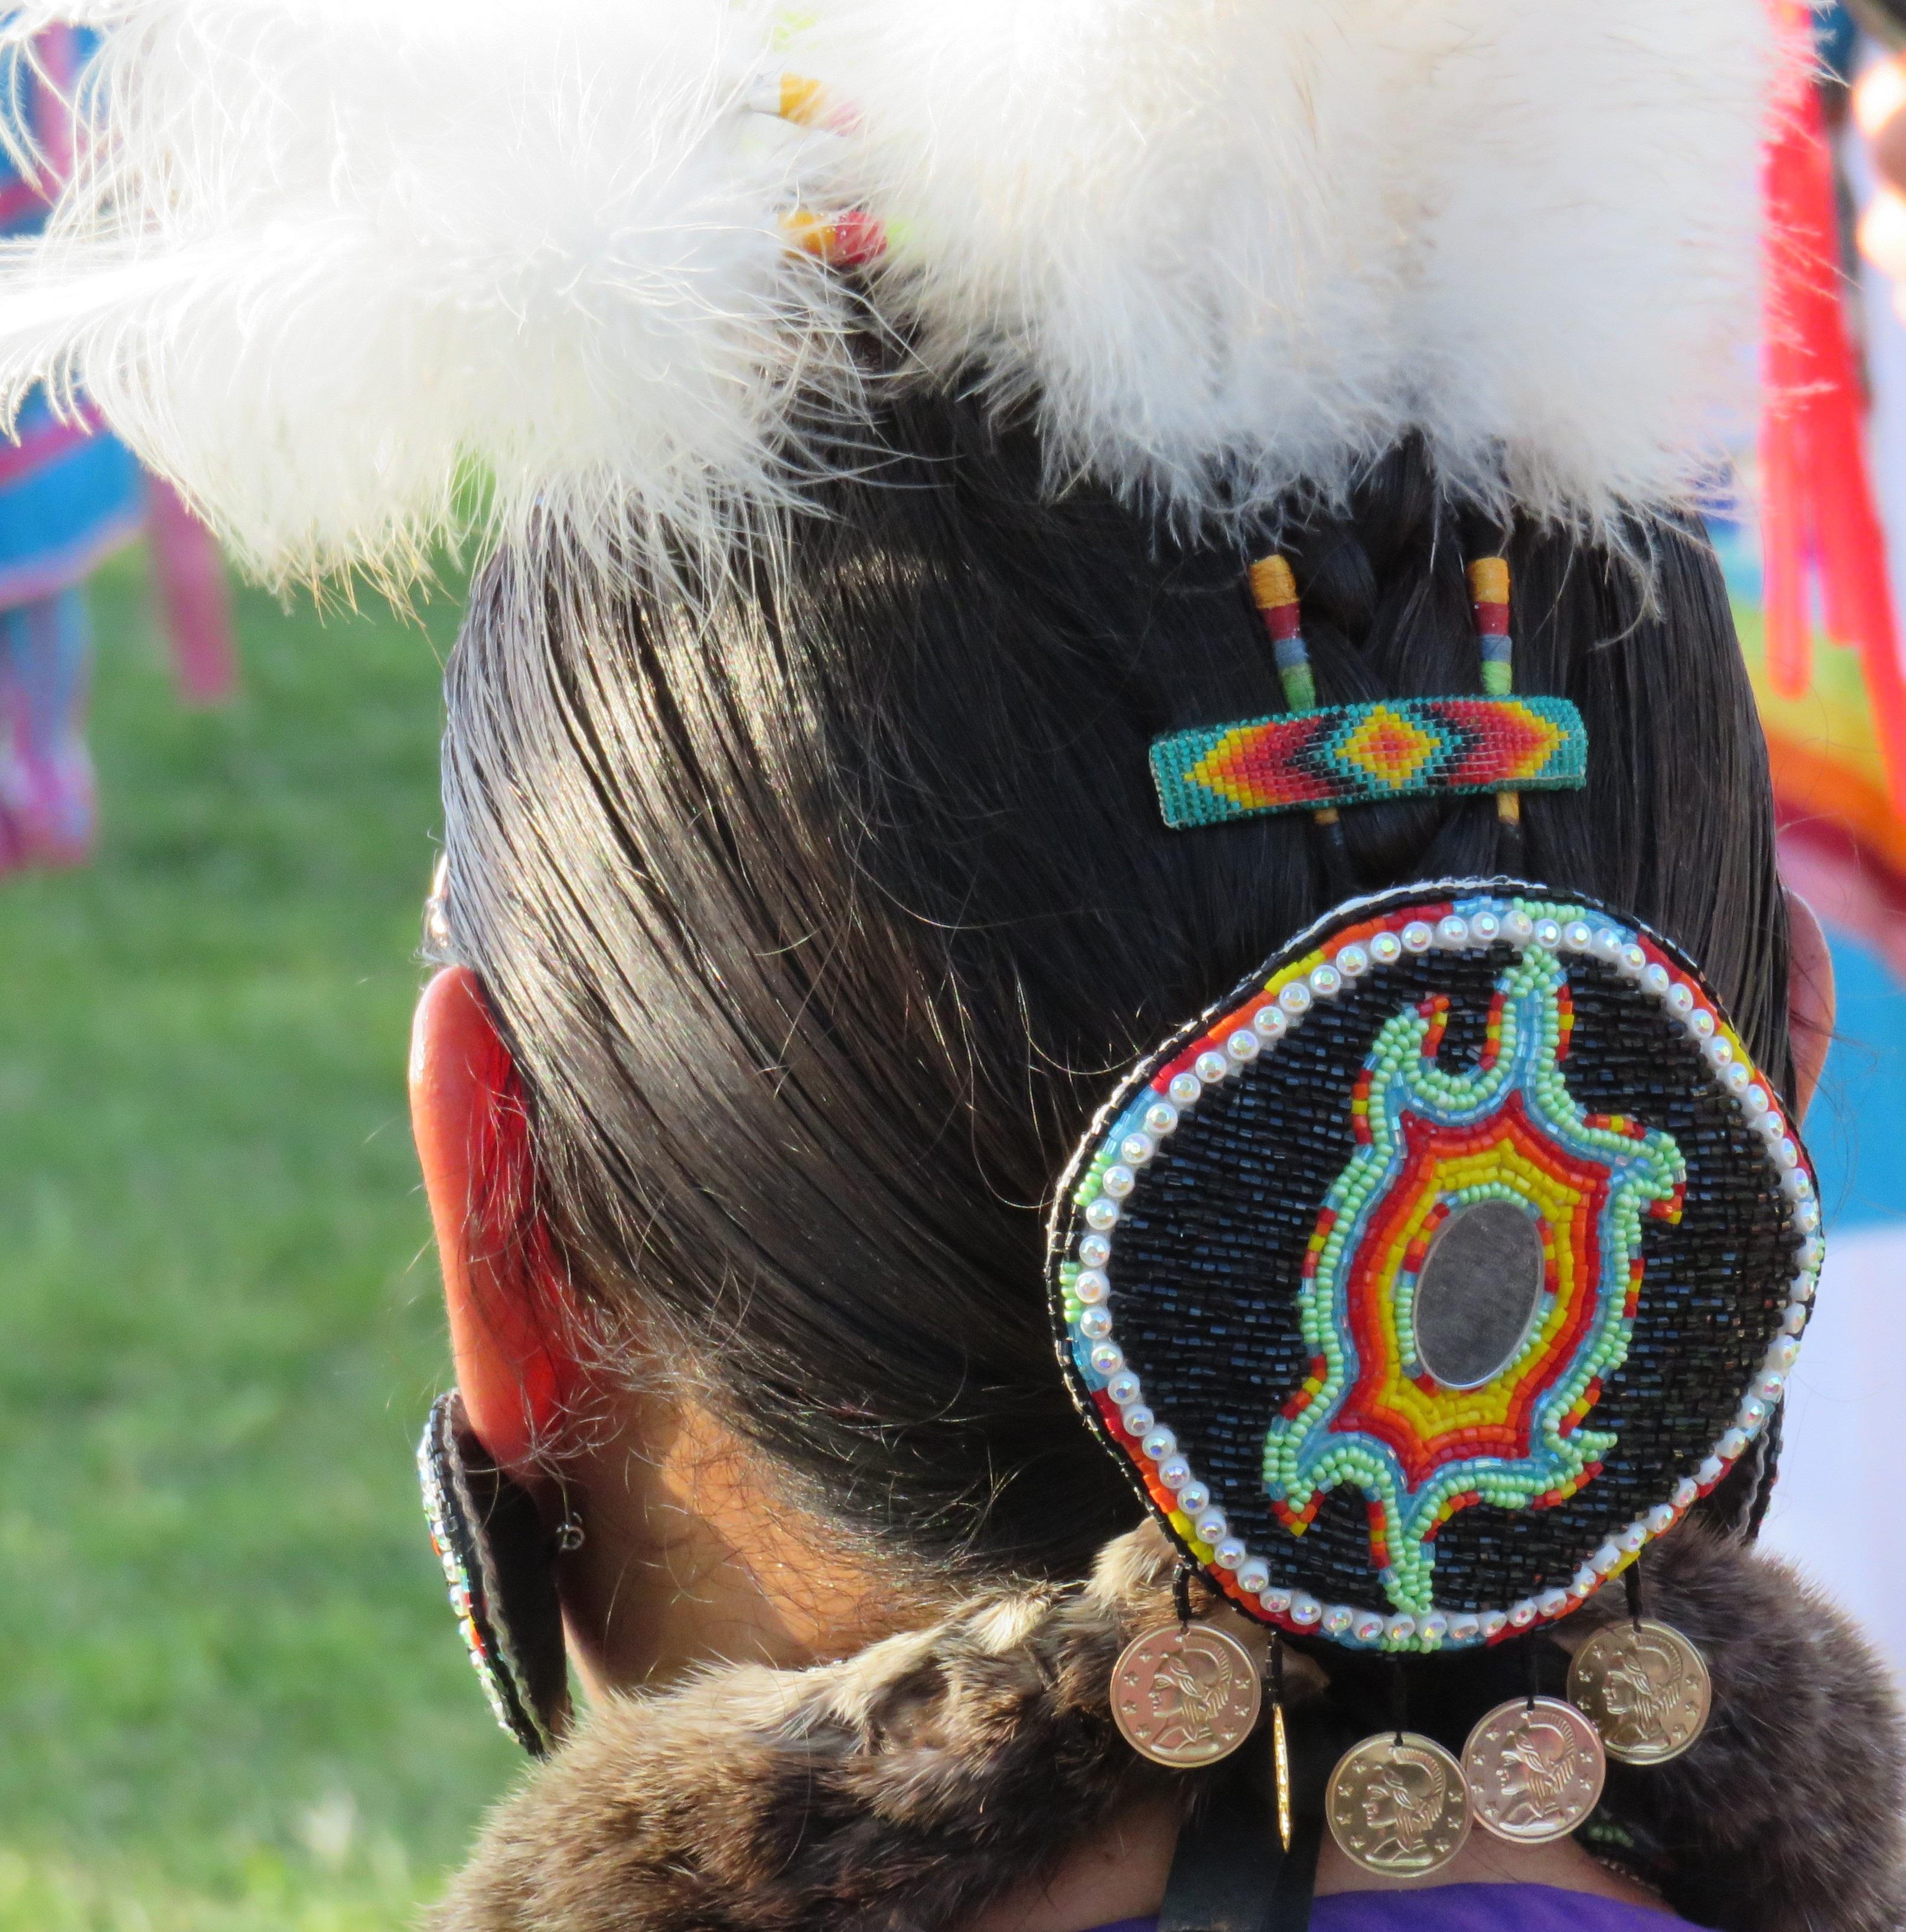 Fotos Gratis Baile Juguete Pluma Peinado Textil Nativo